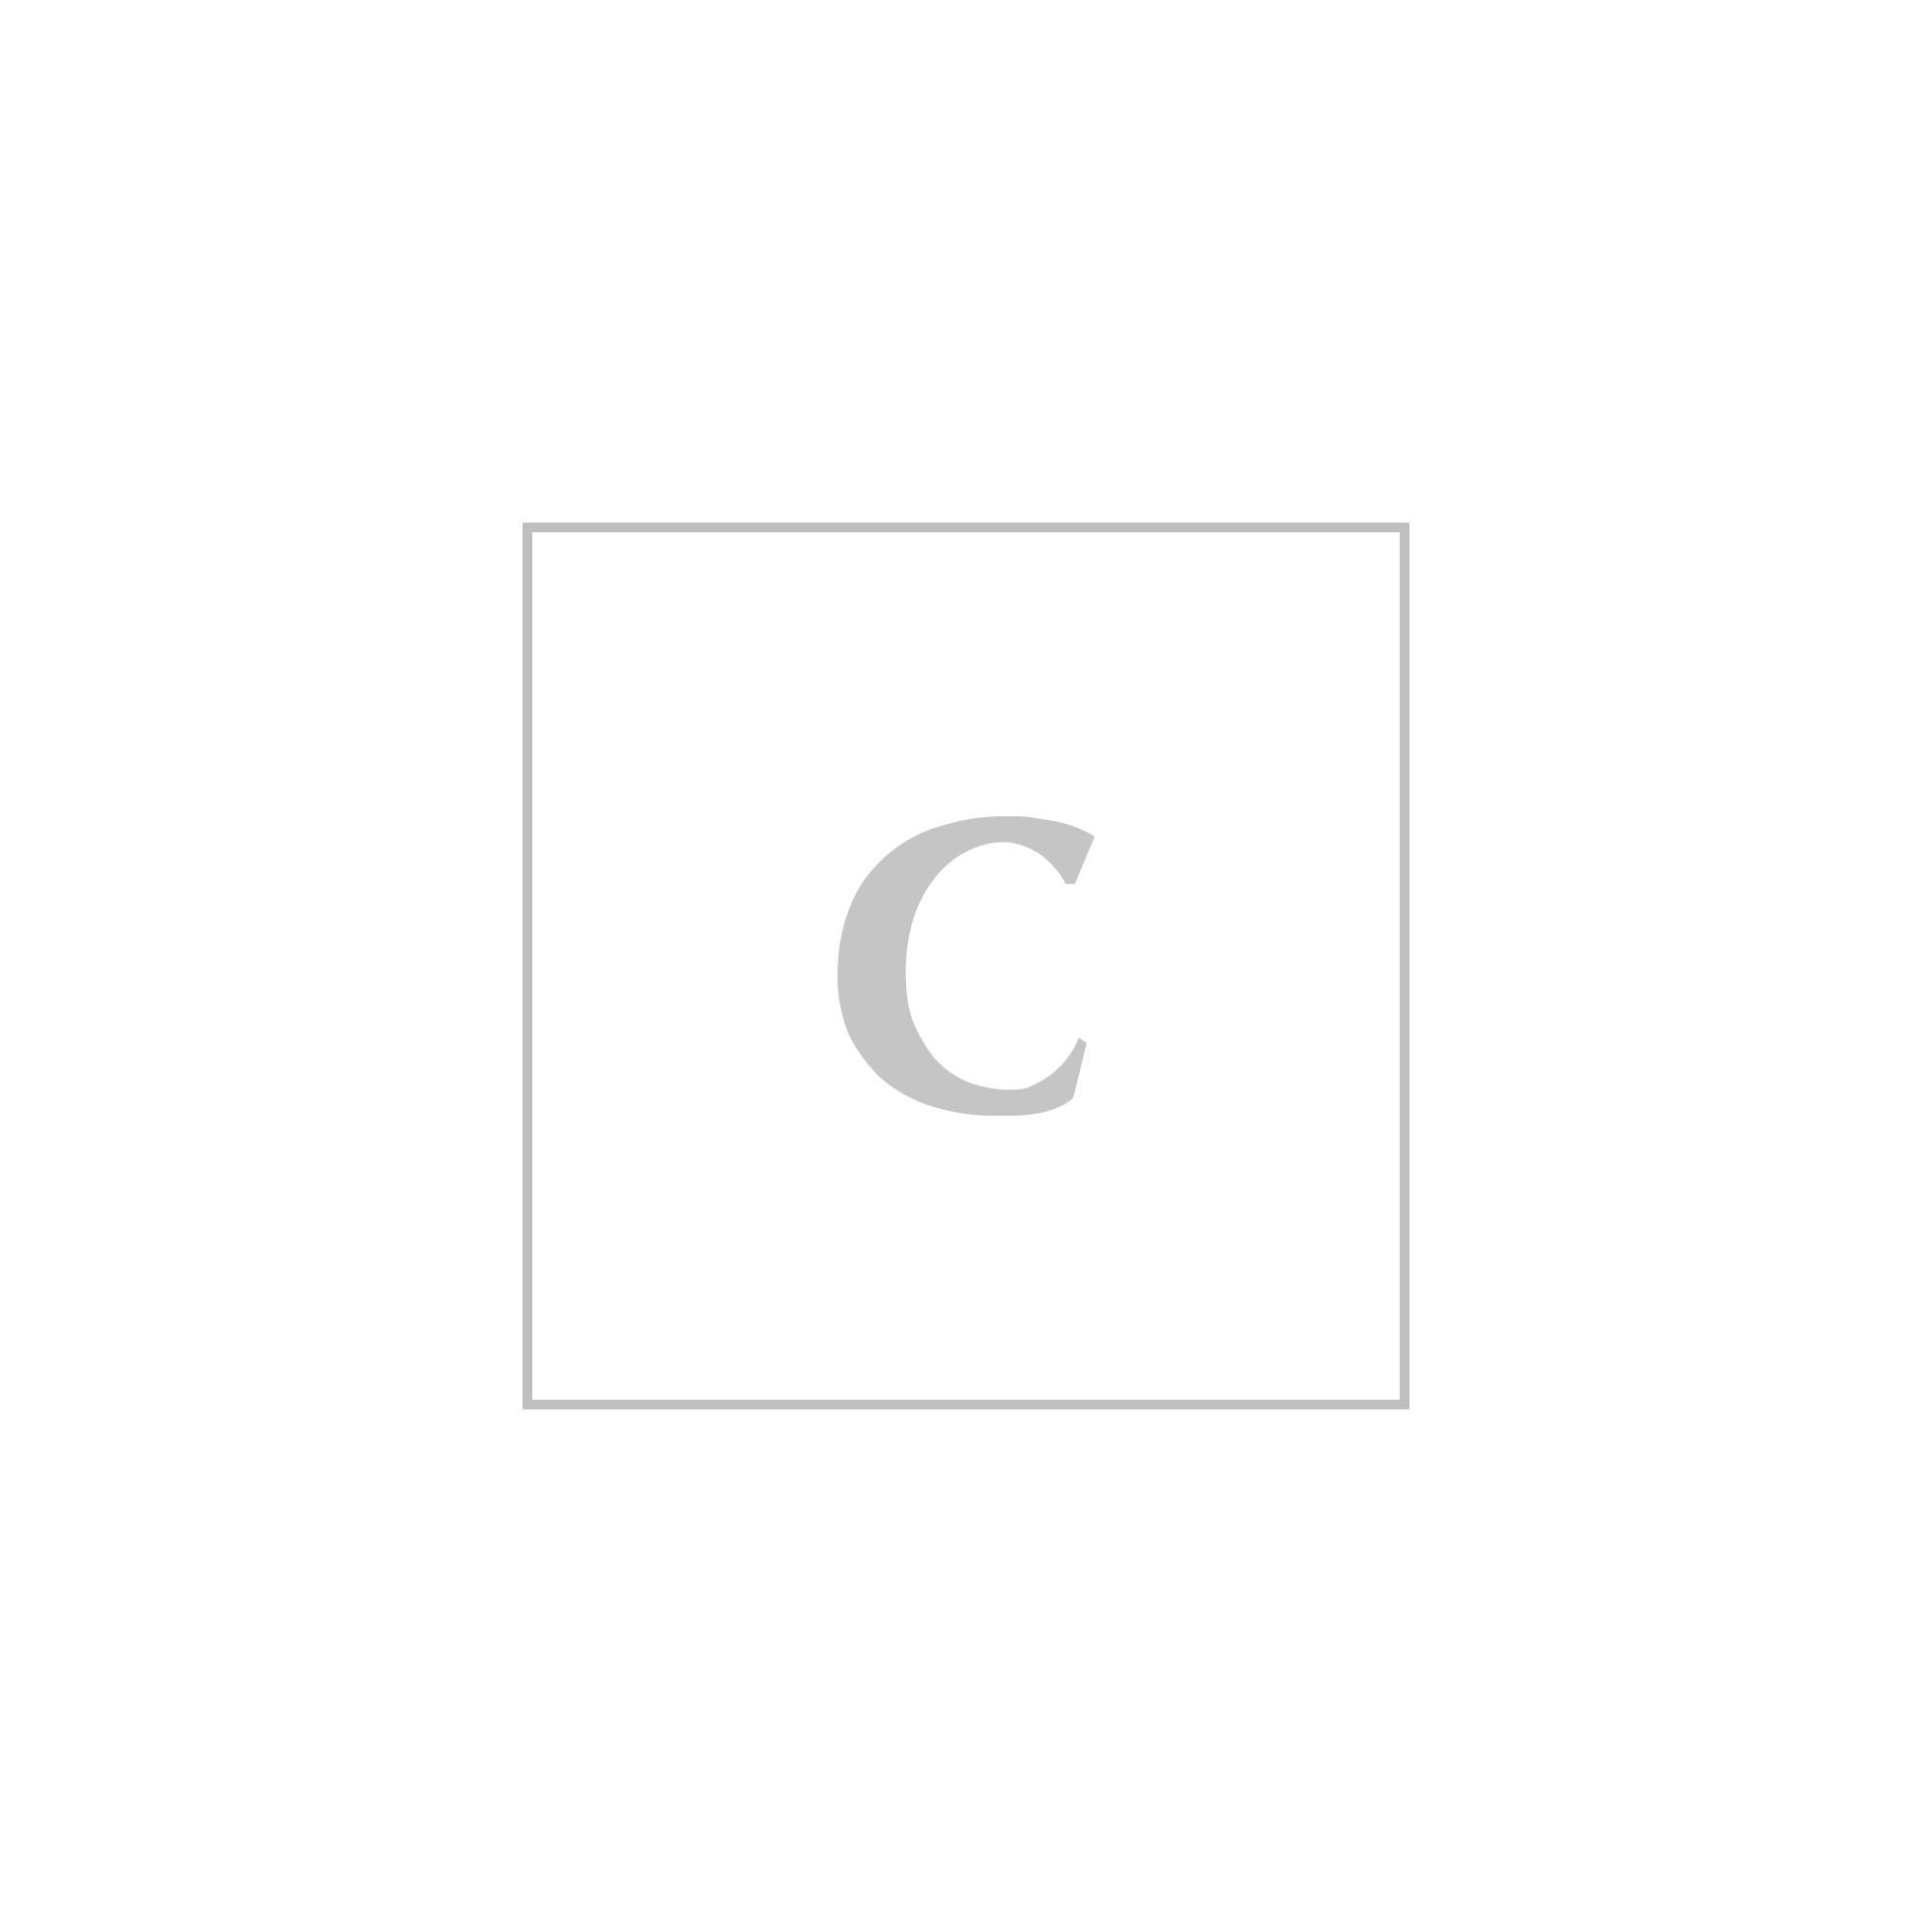 Chiara ferragni calzatura slipper pelle maculato piercing